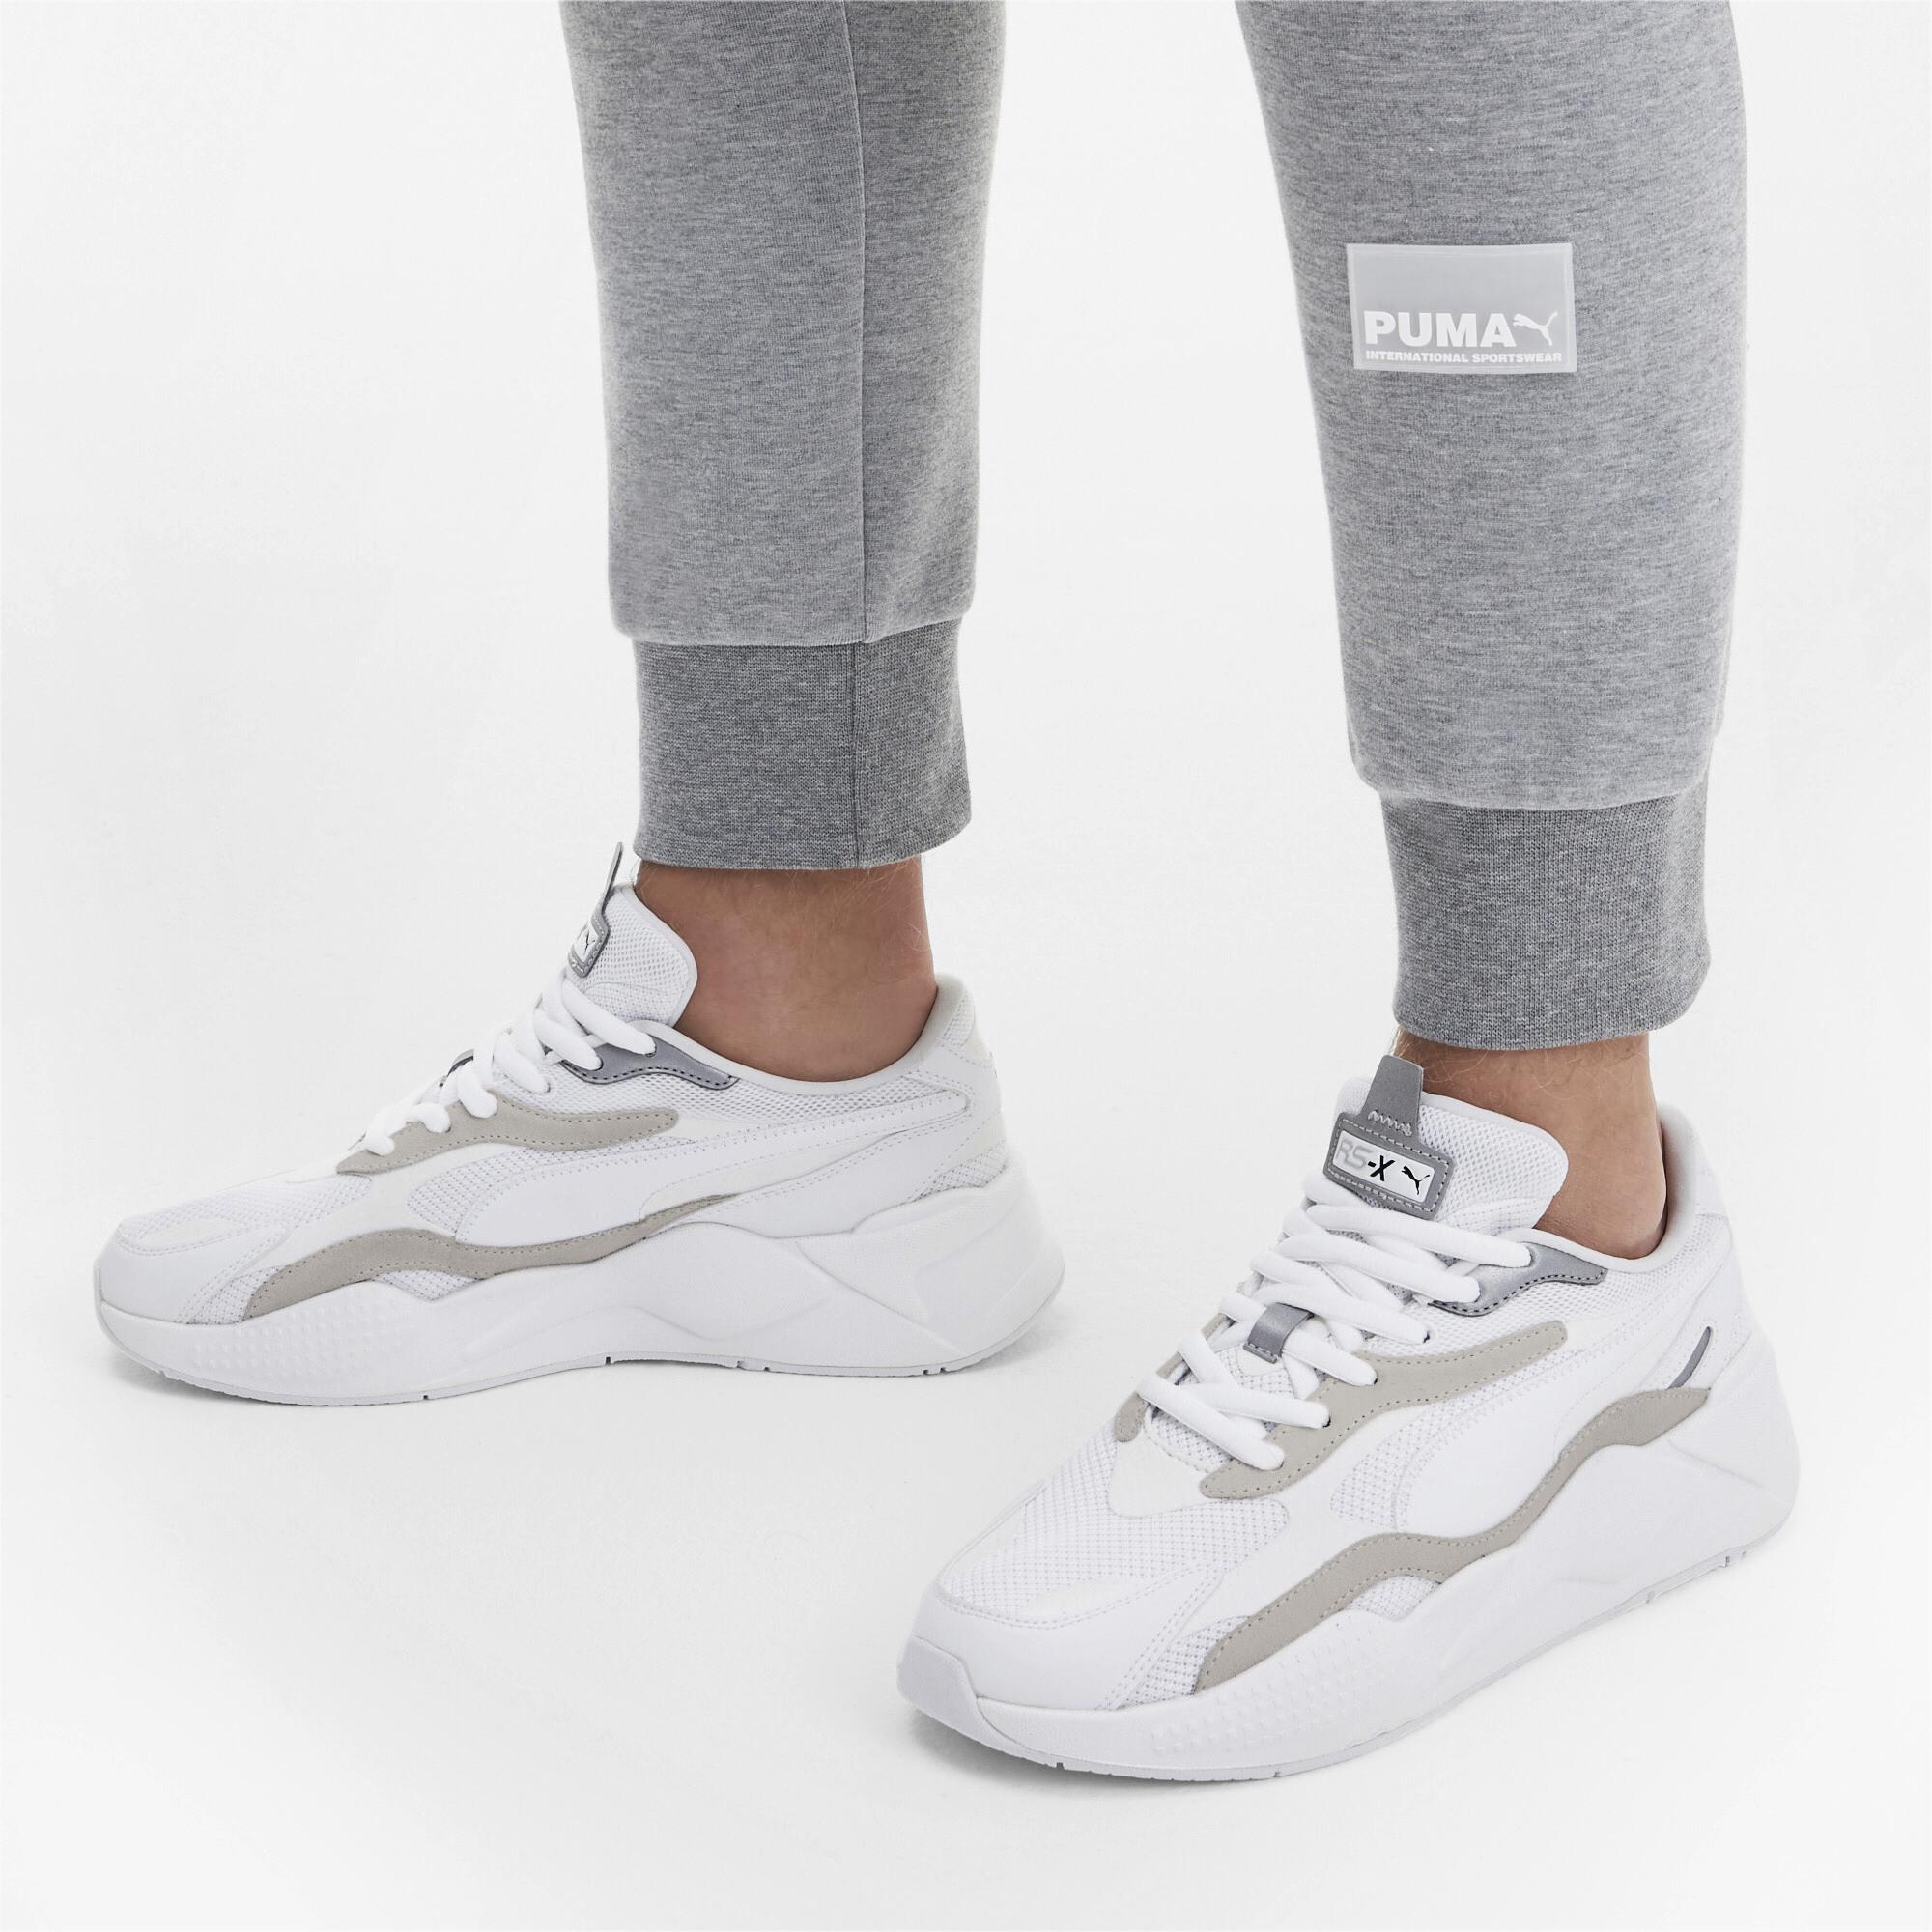 PUMA-Men-039-s-RS-X-Puzzle-Sneakers thumbnail 18